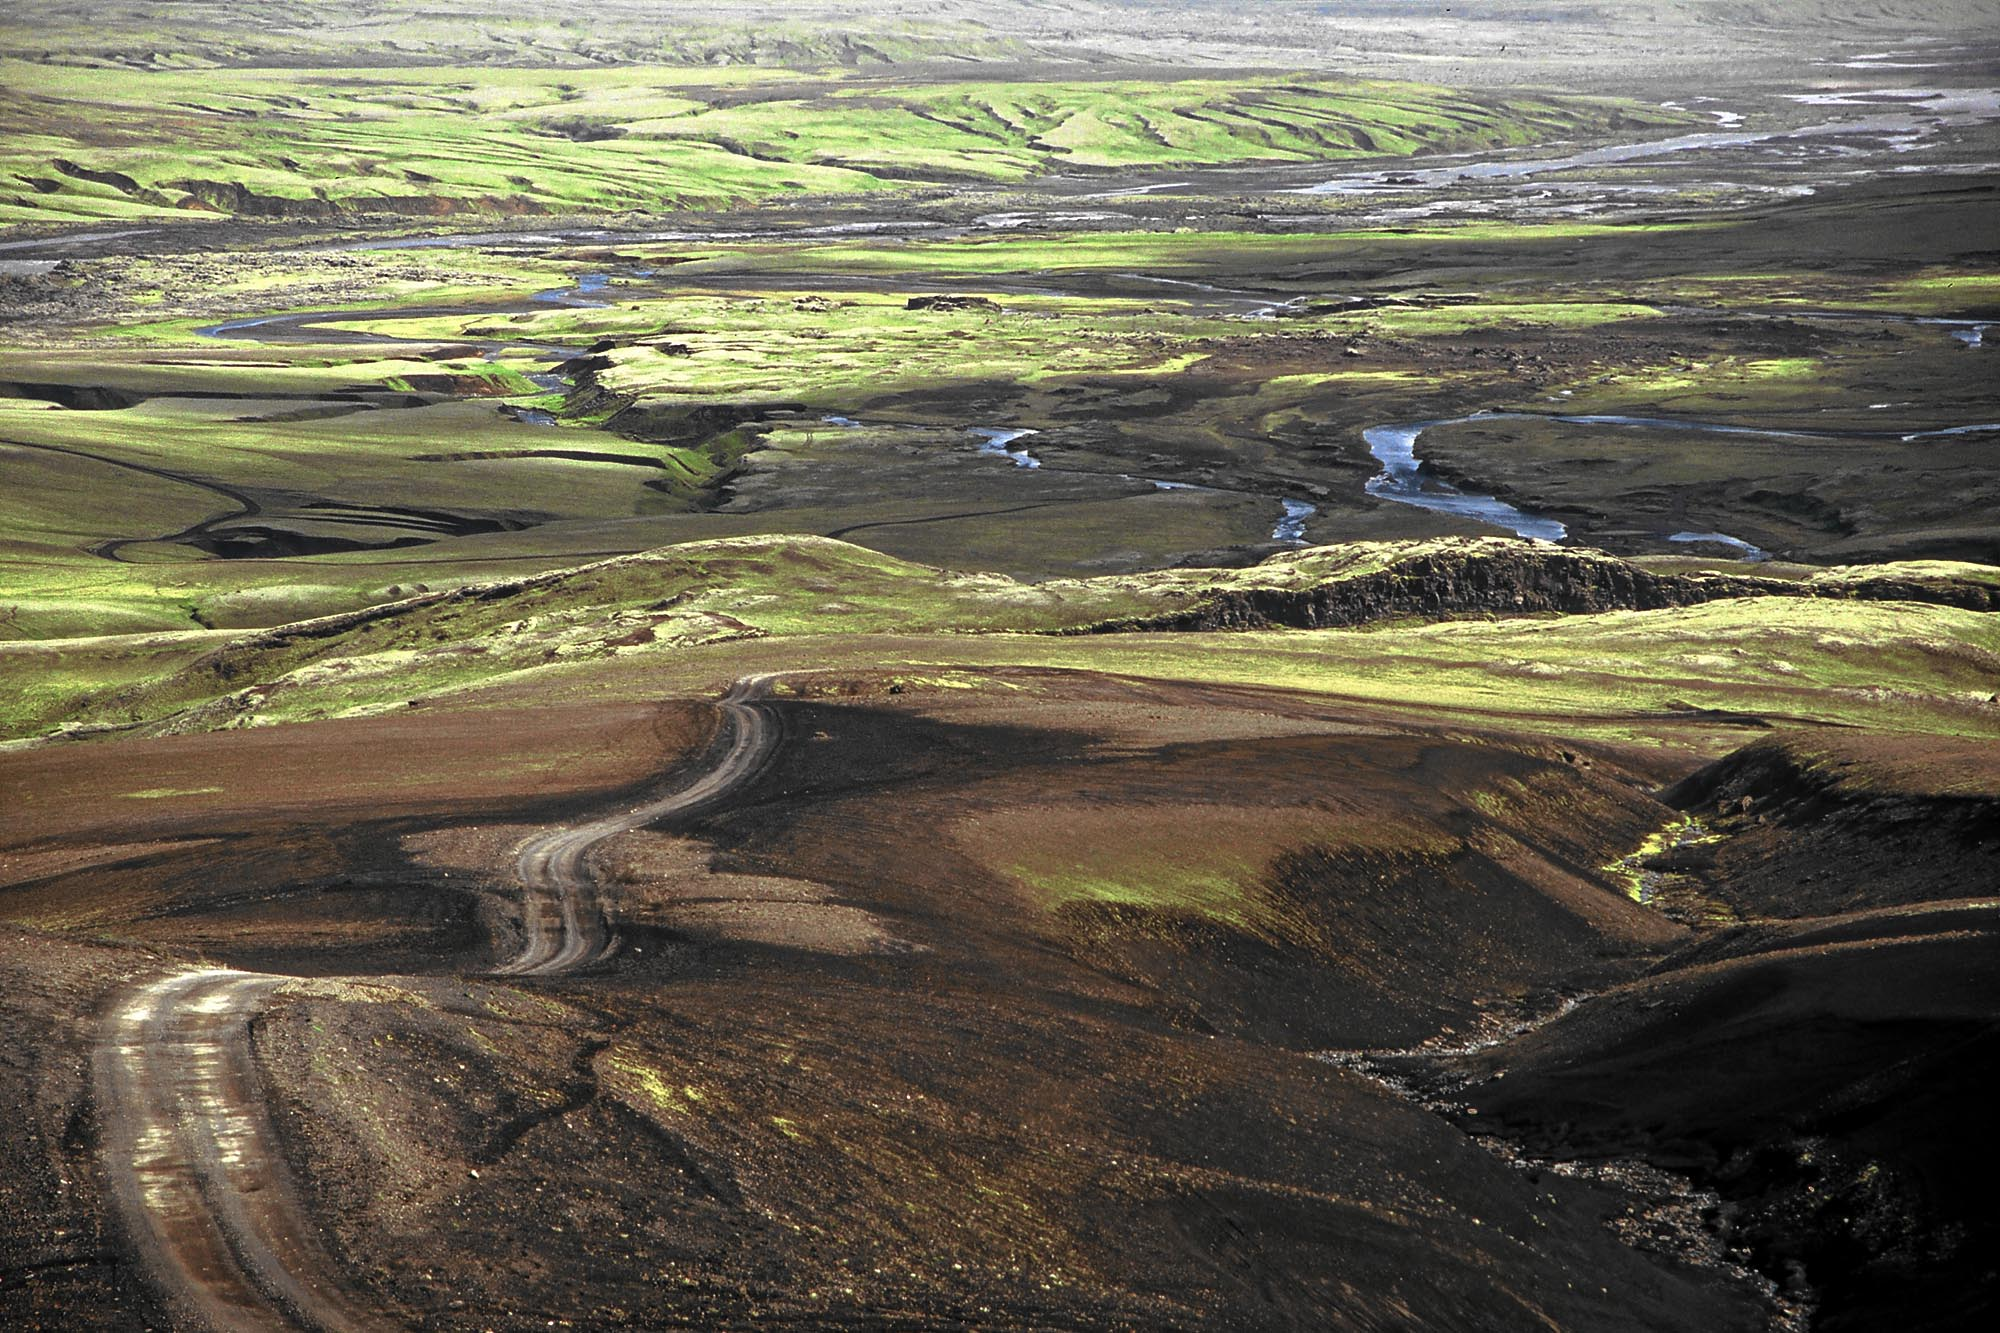 island-piste-lavafeld-small